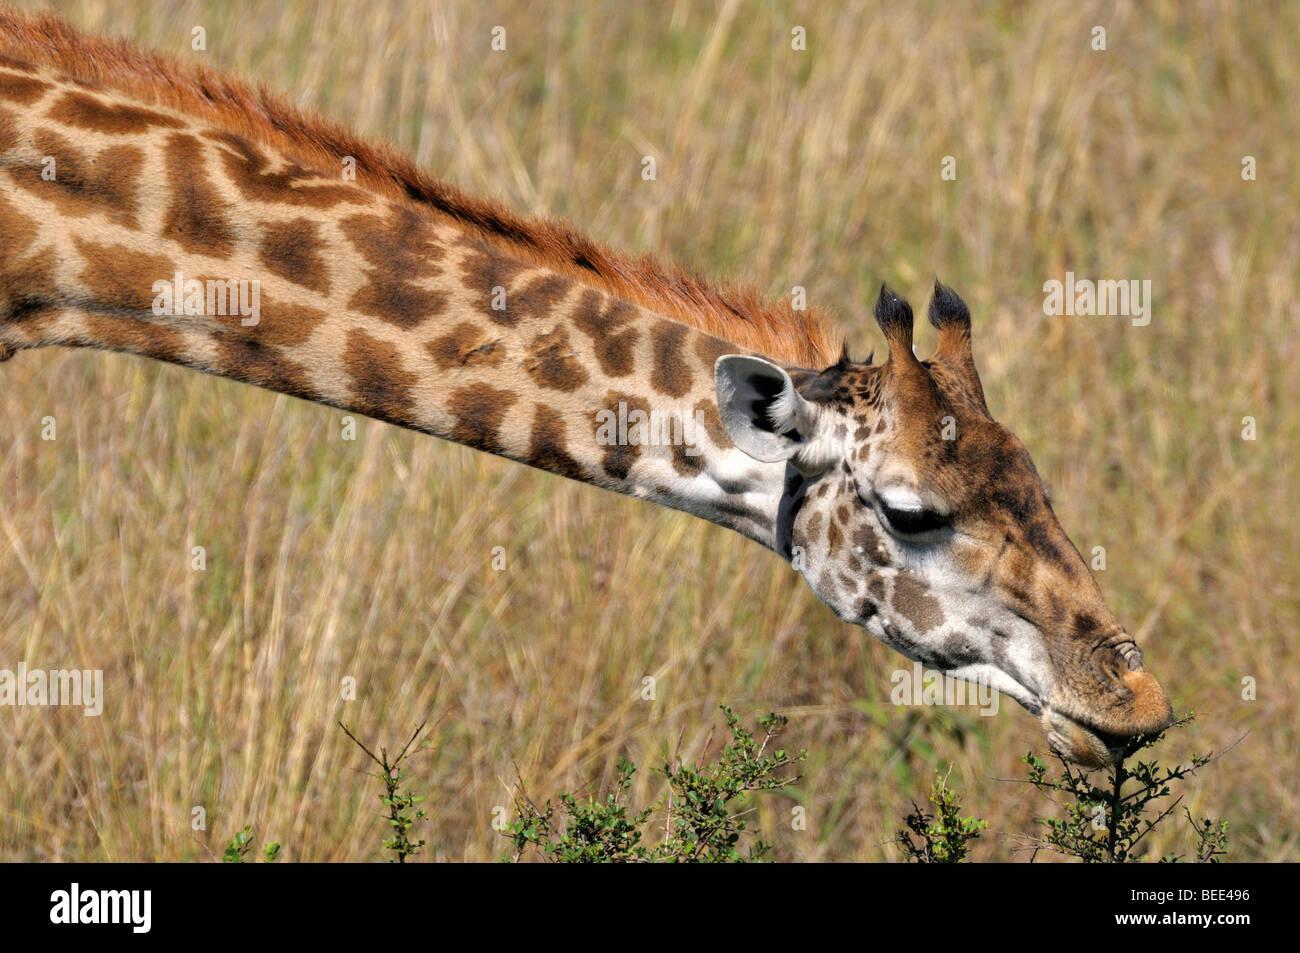 Masai Giraffe (Giraffa camelopardalis tippelskirchi), portrait, Masai Mara Nature Reserve, Kenya, East Africa - Stock Image